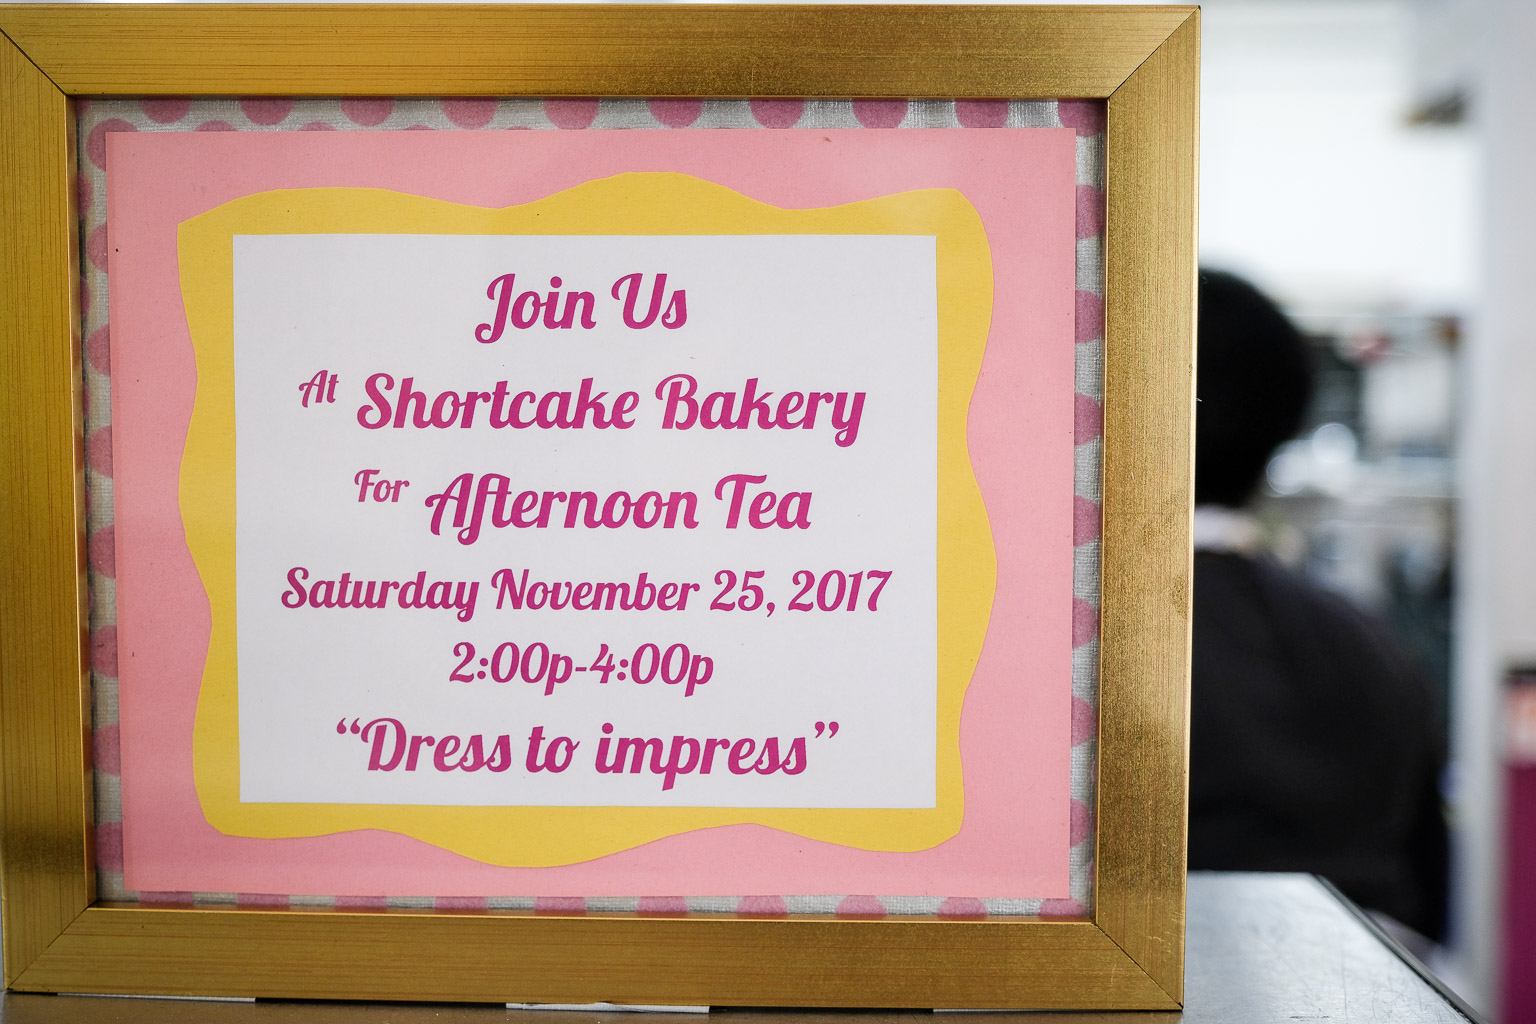 Shortcake_Reopening_11-18-17-005-Lenzy-Ruffin-Event-Photography-Washington-DC-Fuji-X-T2.jpg